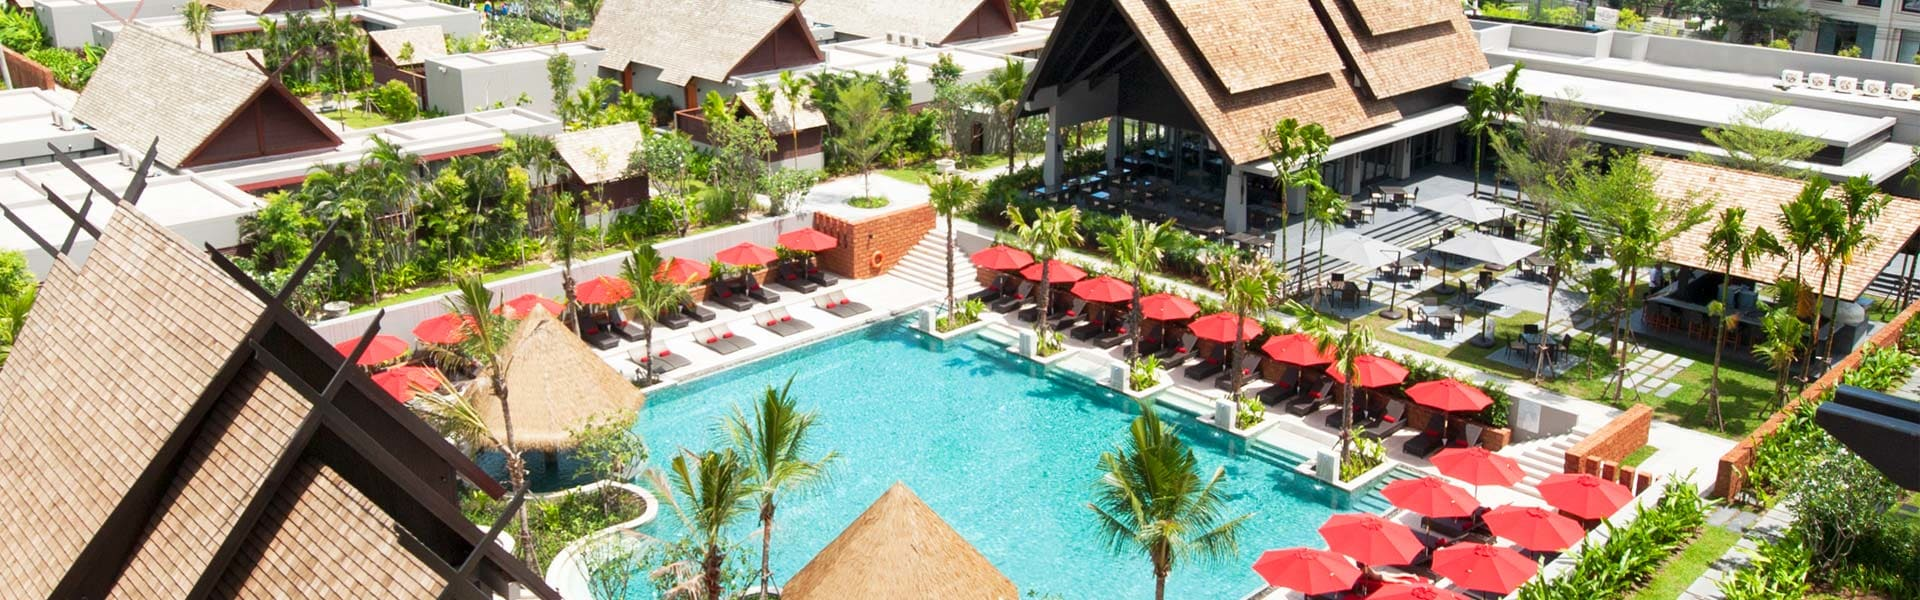 Anantara Mai Khao Serviced Suites Villas Contact Details